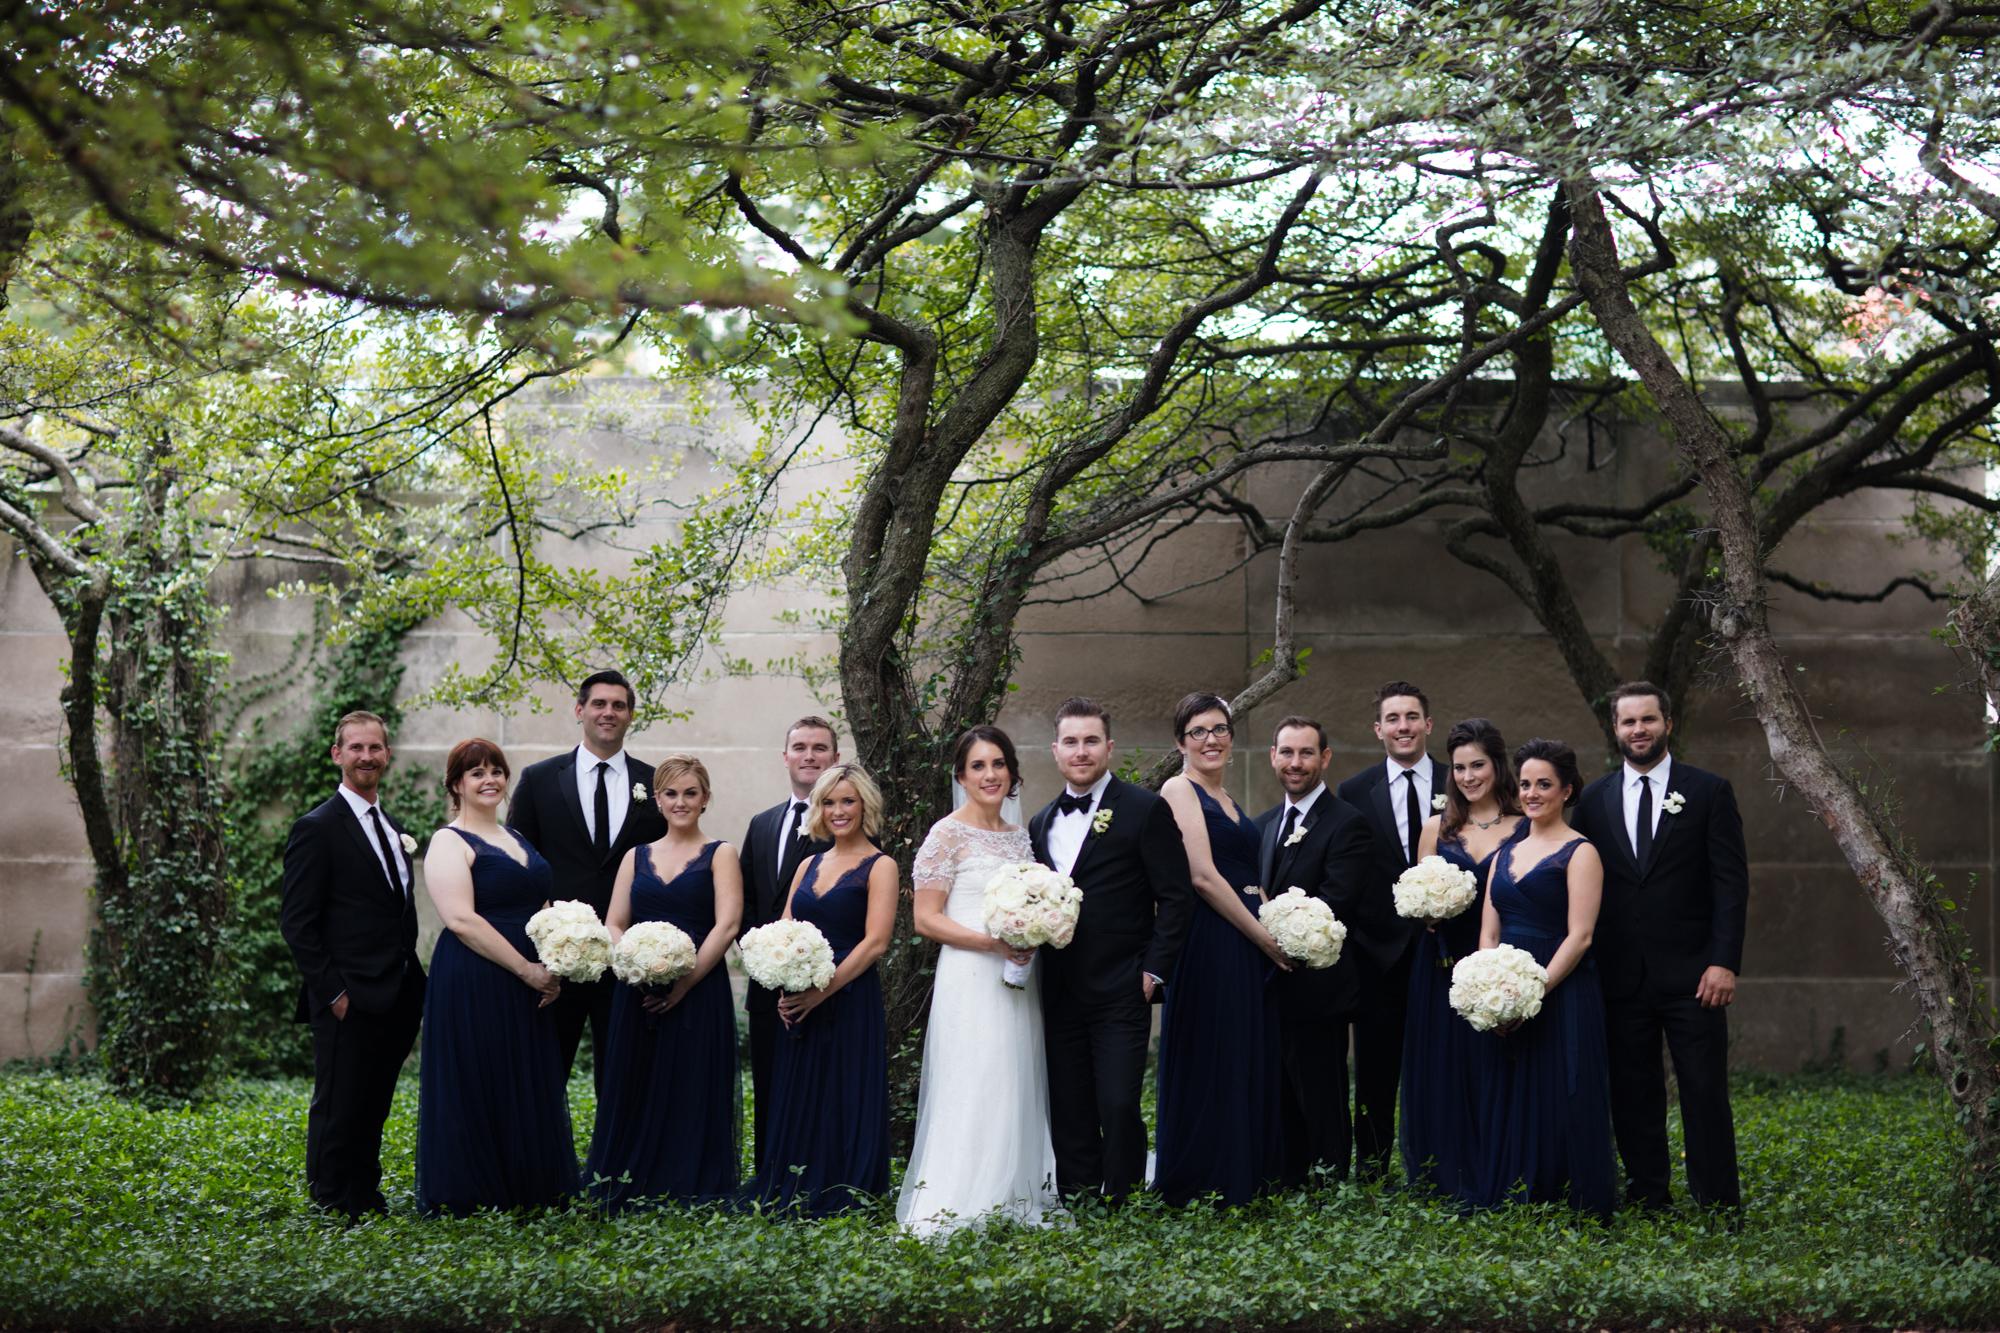 Fashion bridal party portrait in Chicago